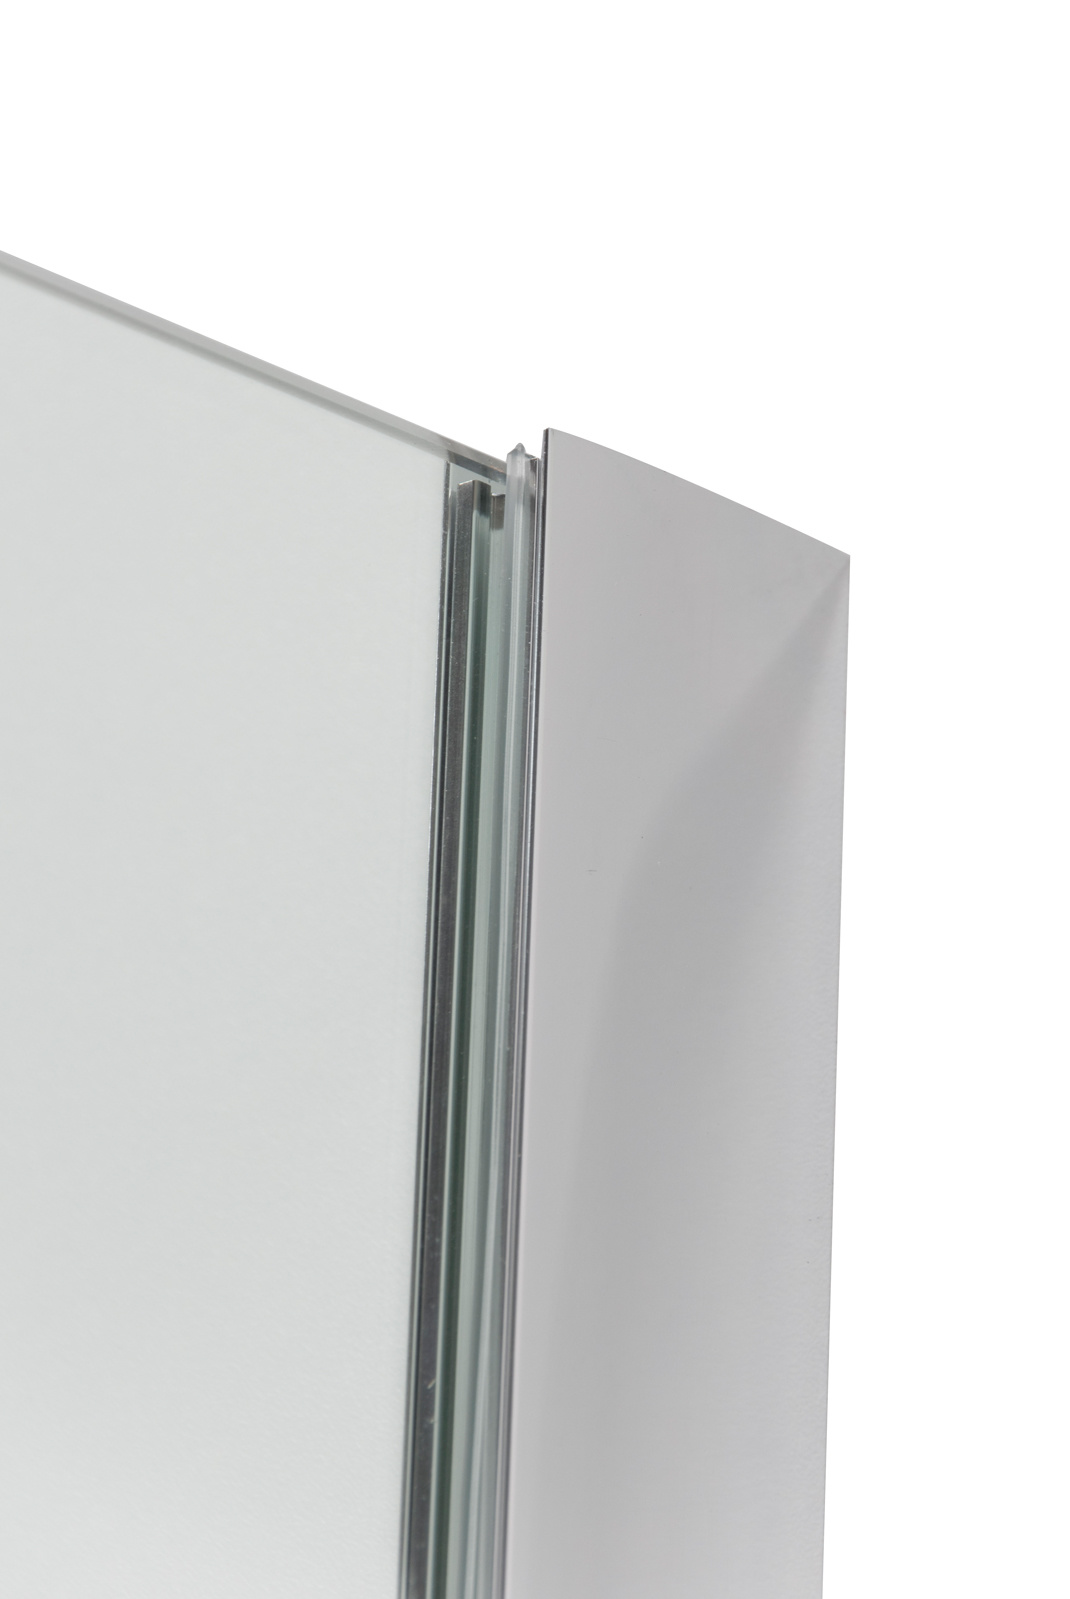 Linea Uno Inloopdouche Göteborg 130 x 200 cm